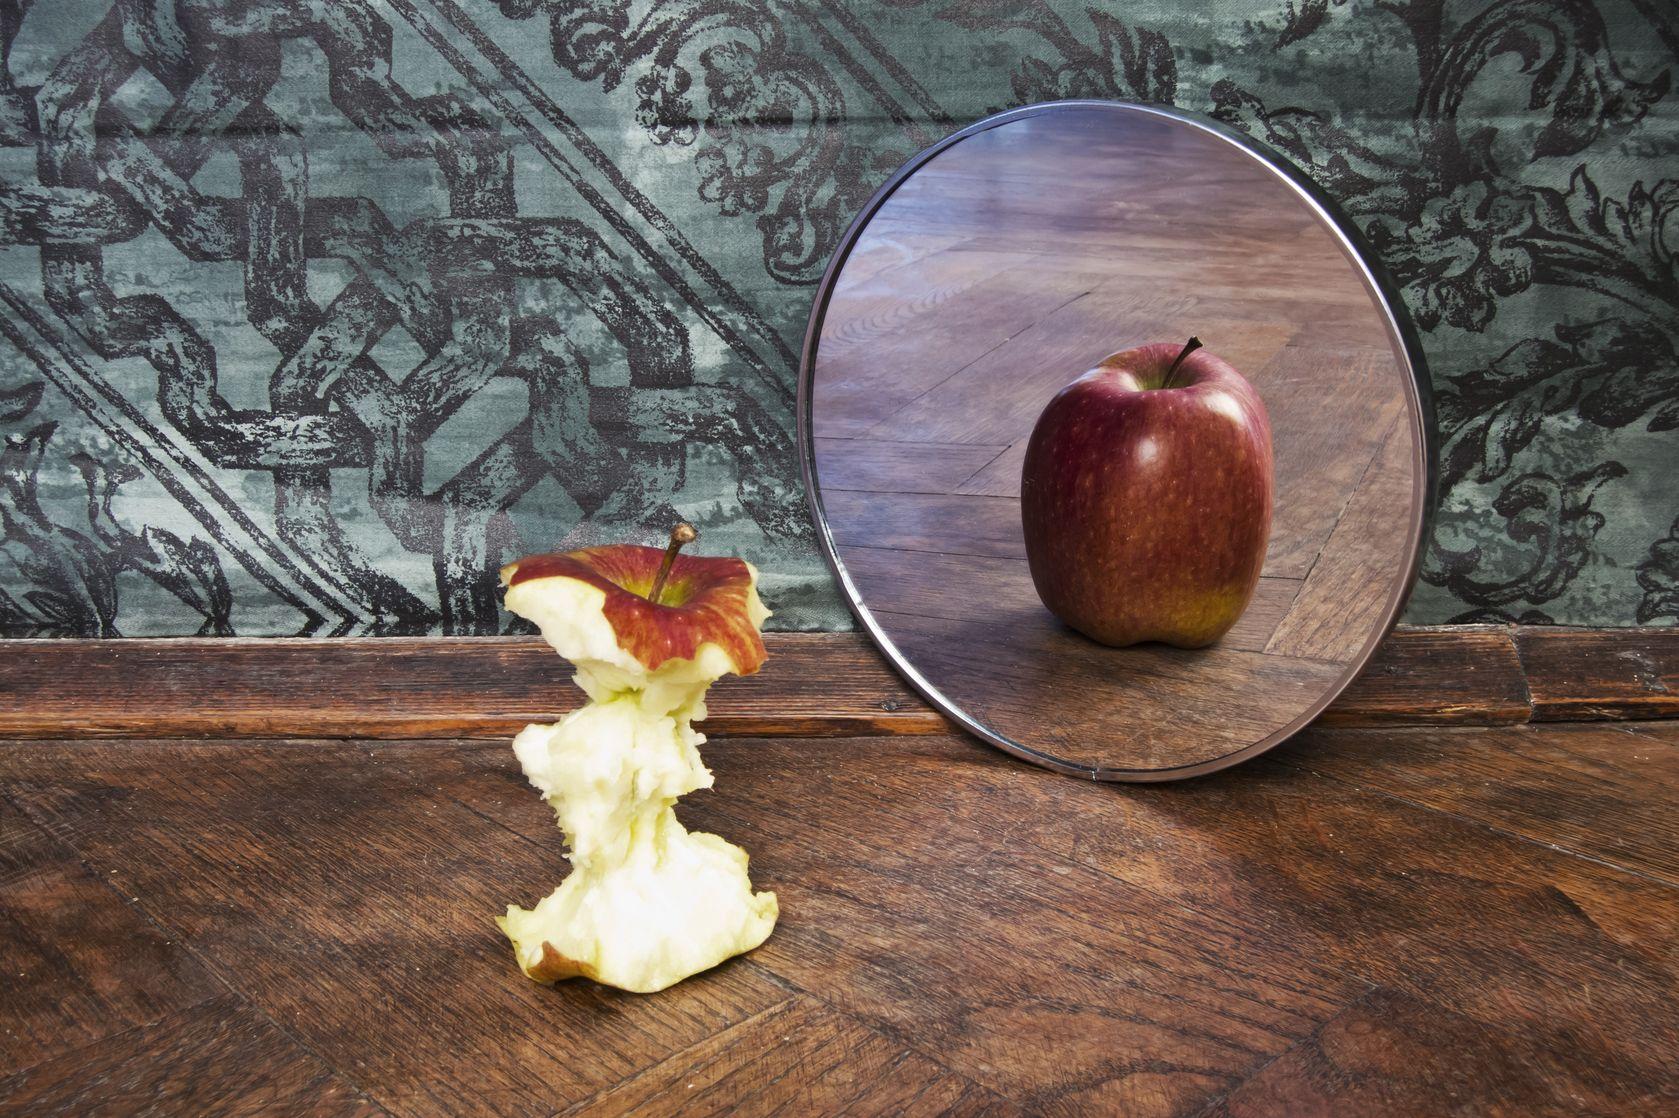 Perception meets reality